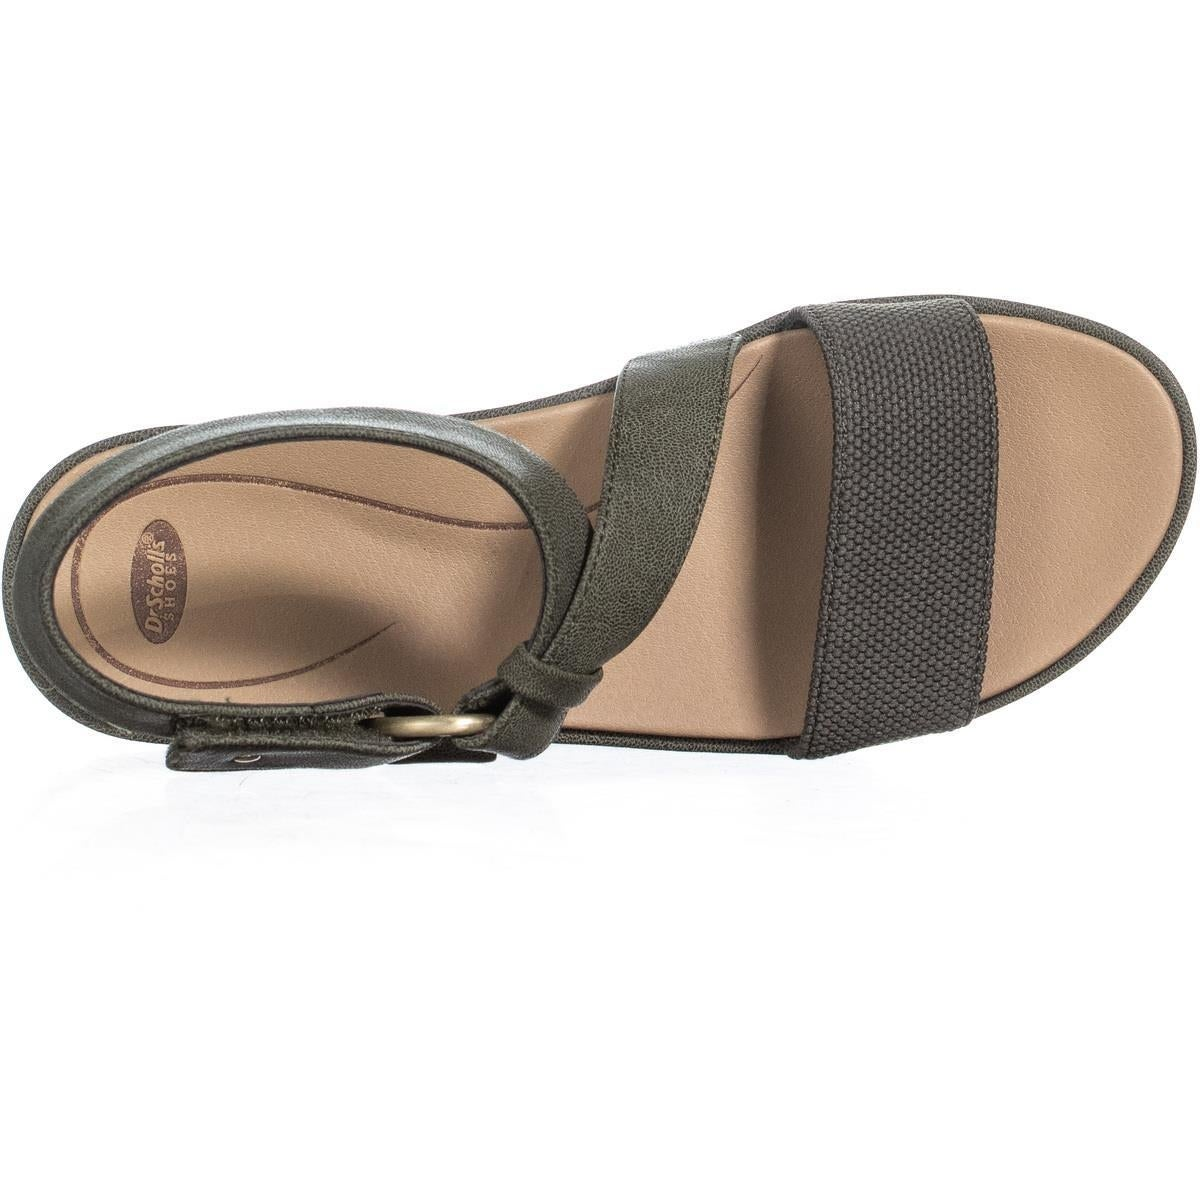 5b09010156be Shop Dr. Scholl s Powers Flat Sandals